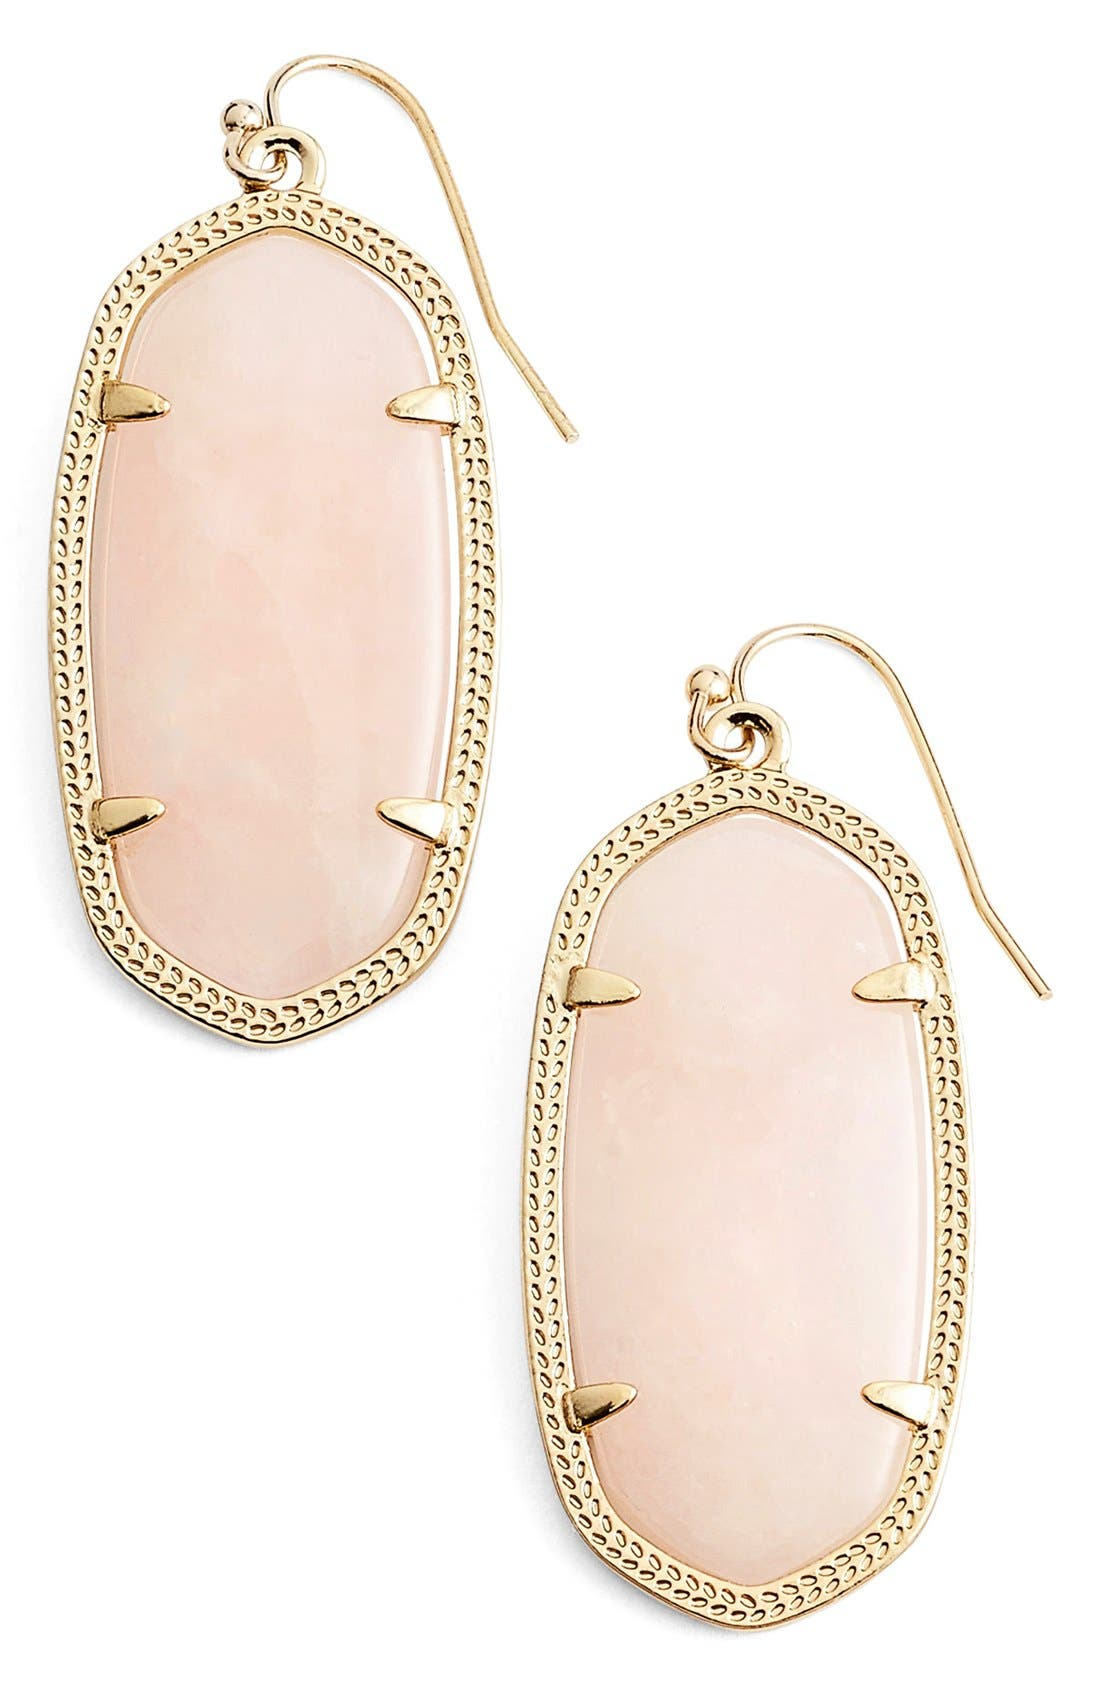 Elle Drop Earrings,                             Main thumbnail 1, color,                             Rose Quartz/ Gold